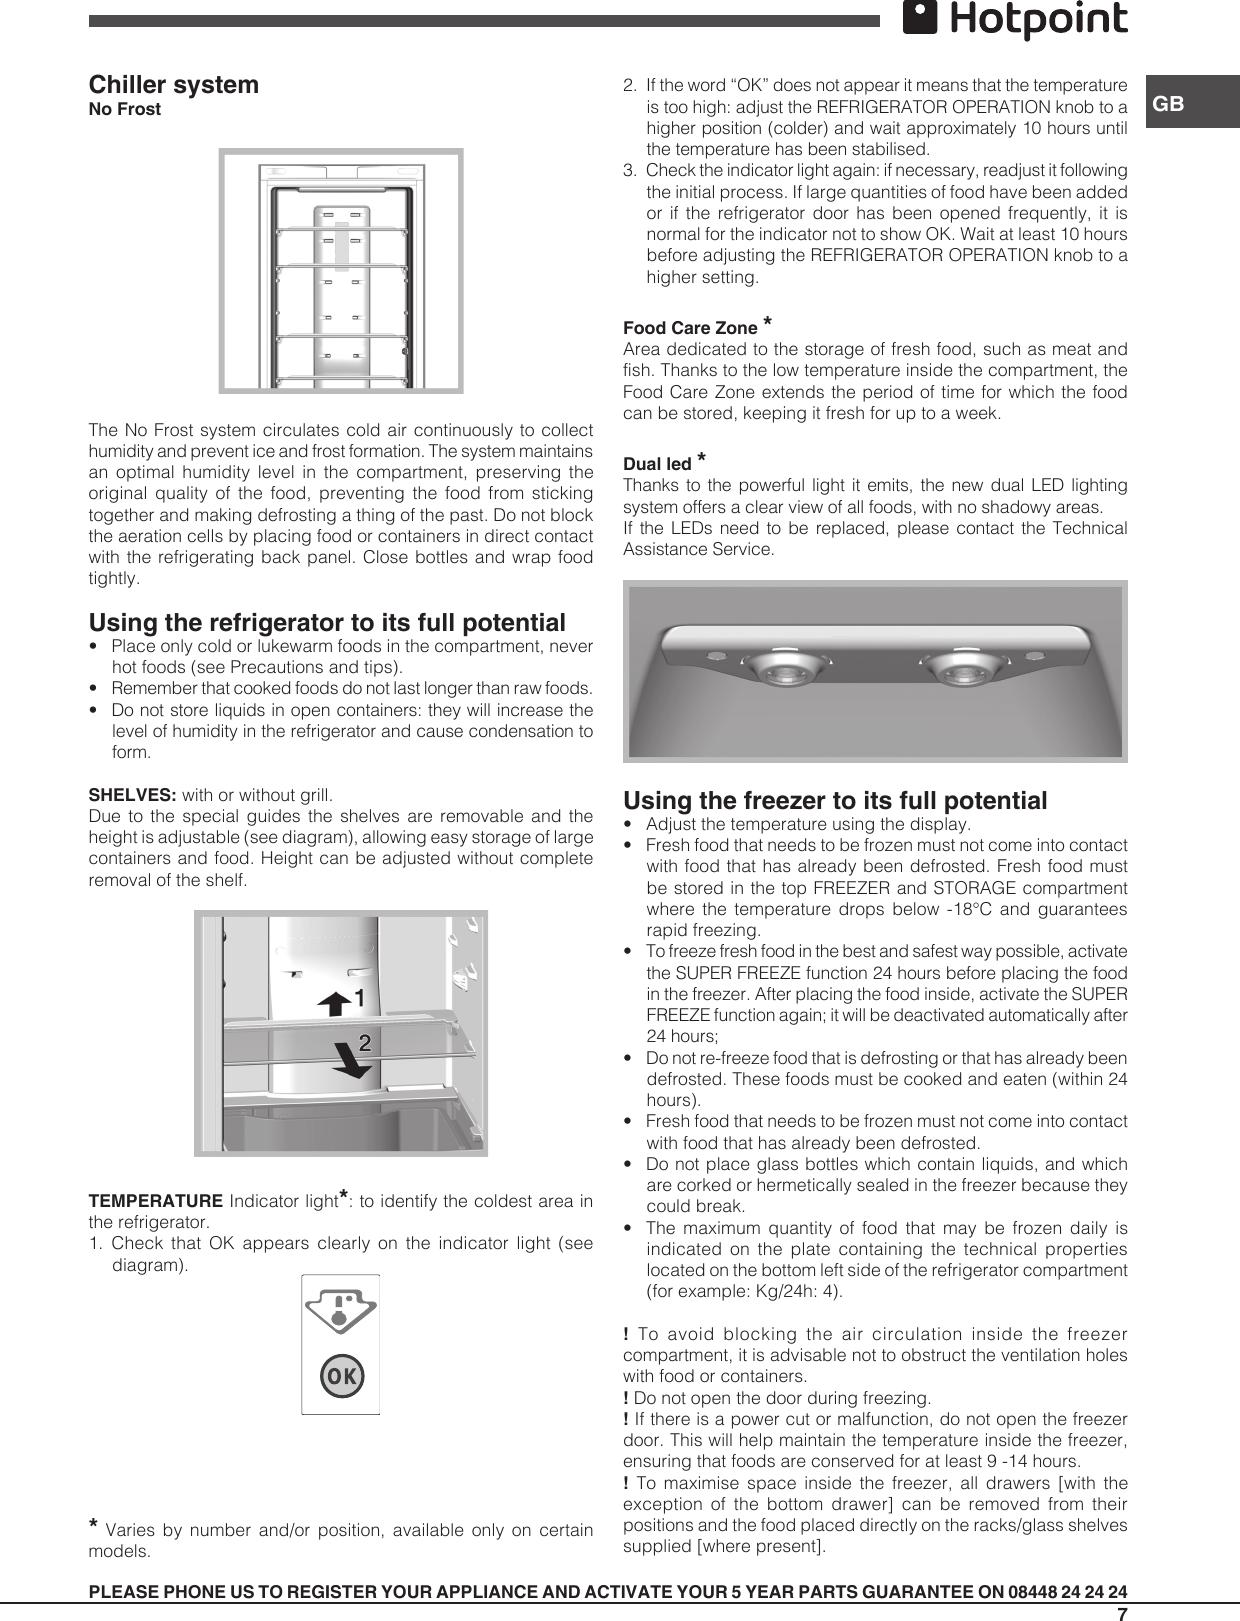 Hotpoint Refrigerator Freezer Combination Ffuq 18Xx X Users Manual